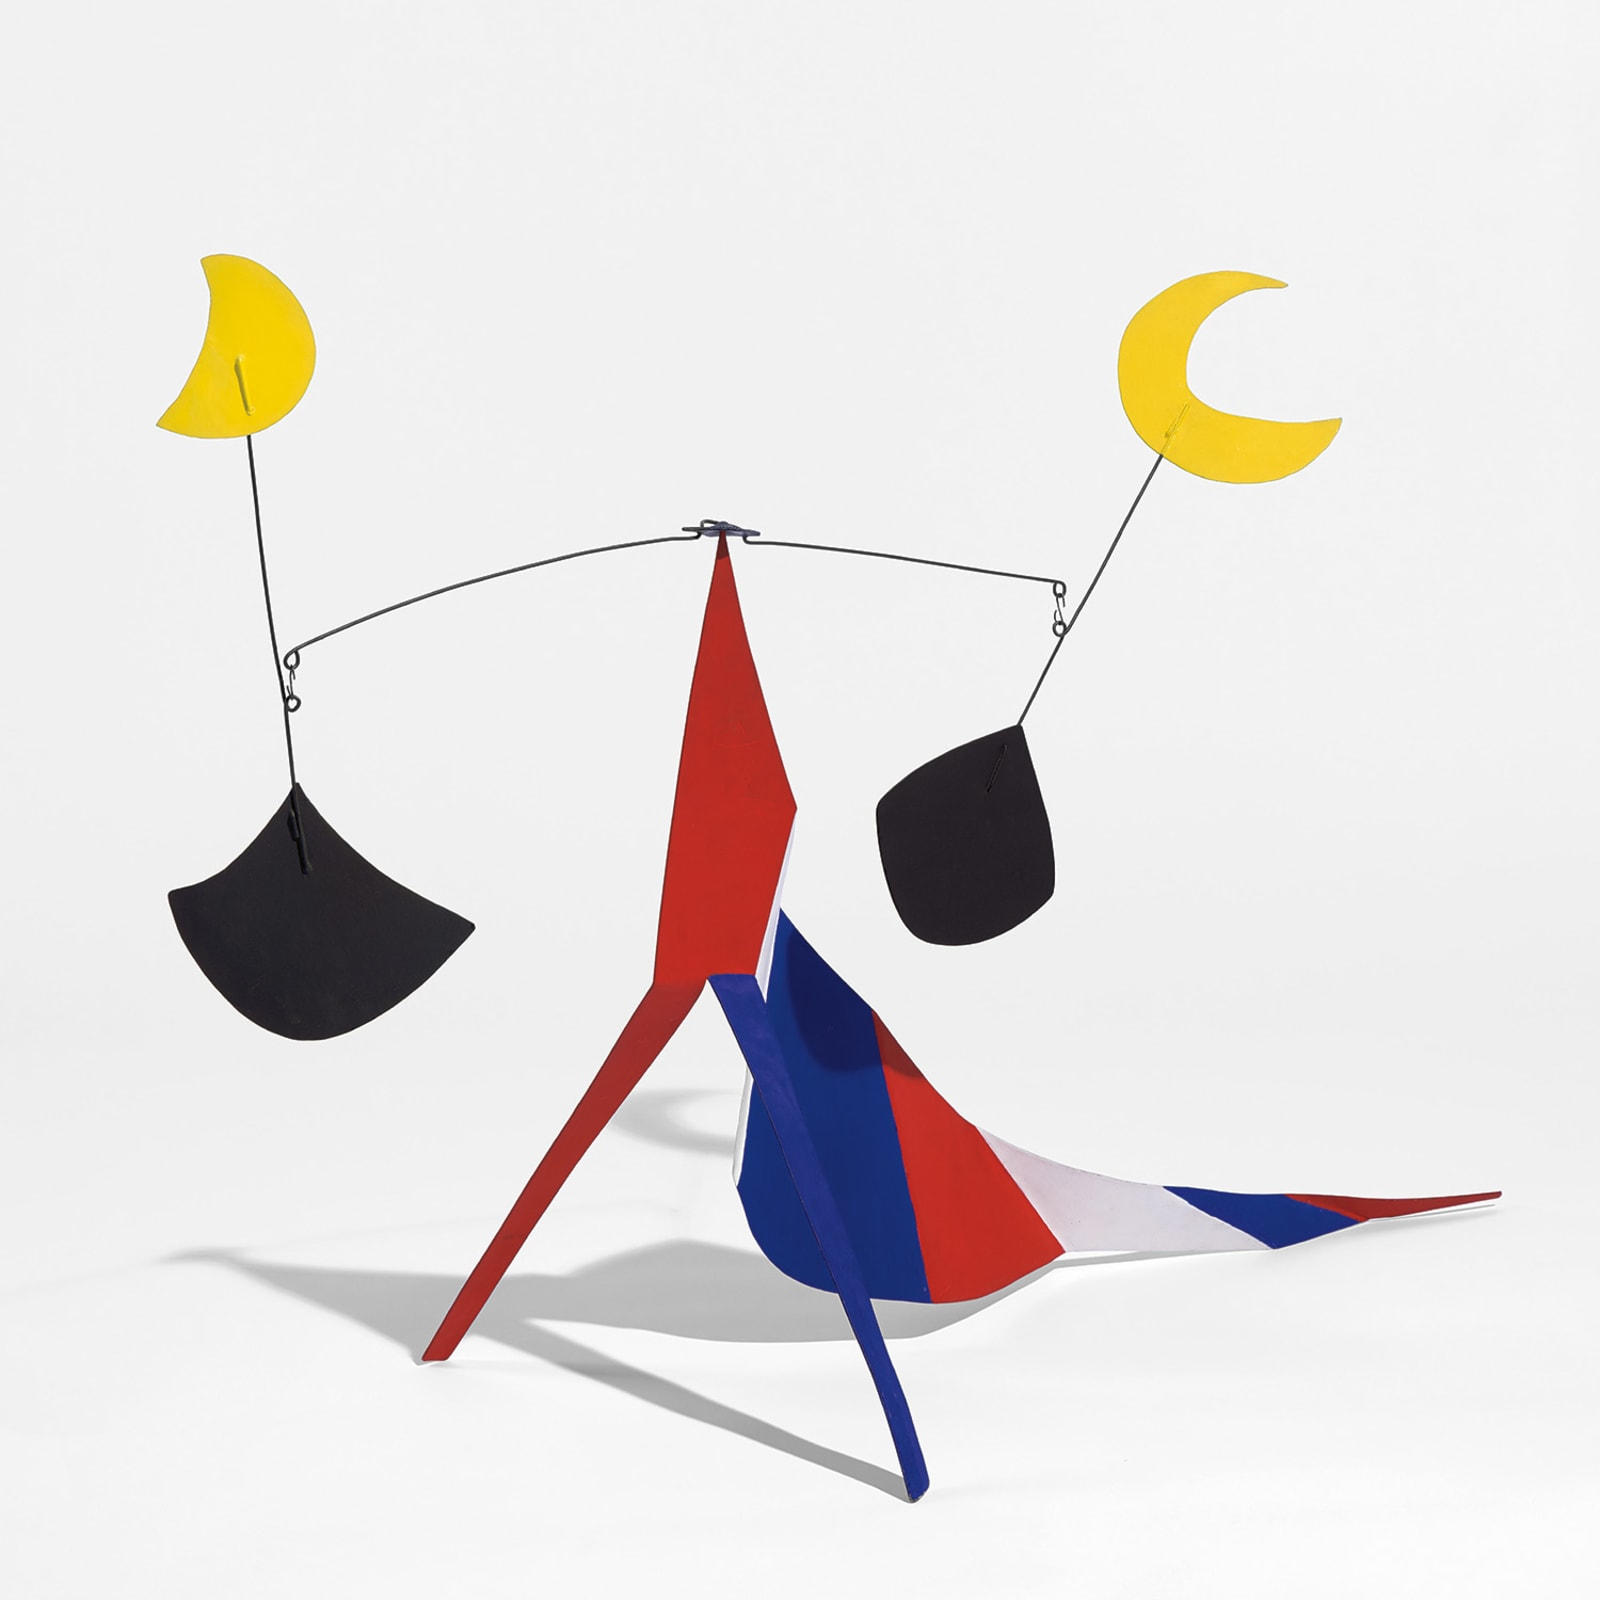 Alexander Calder, Two Moons, 1969